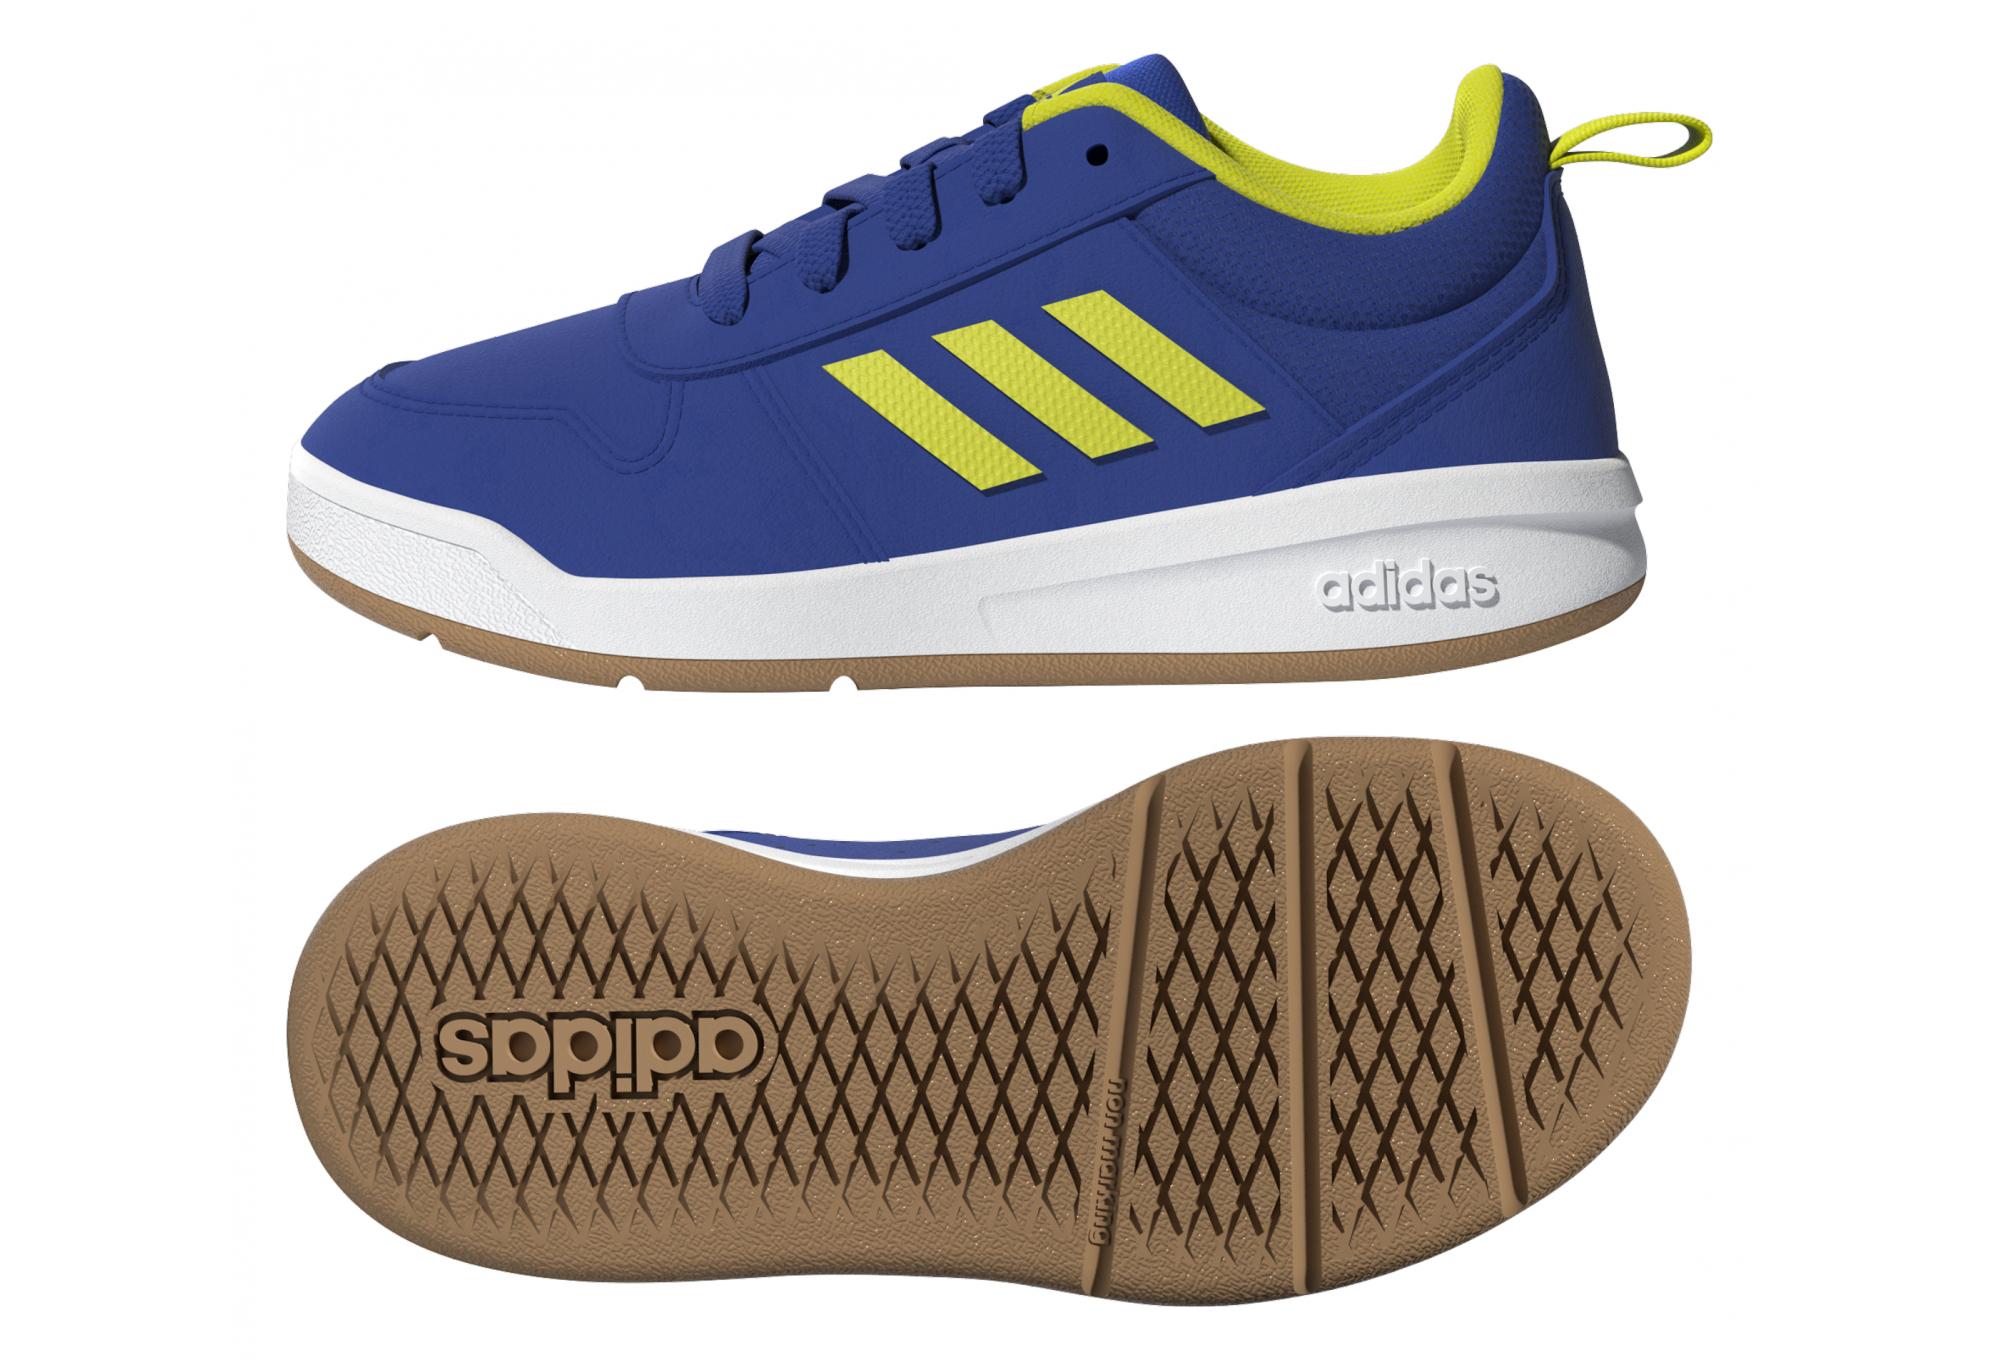 Chaussures de running enfant adidas Tensaur | Alltricks.com